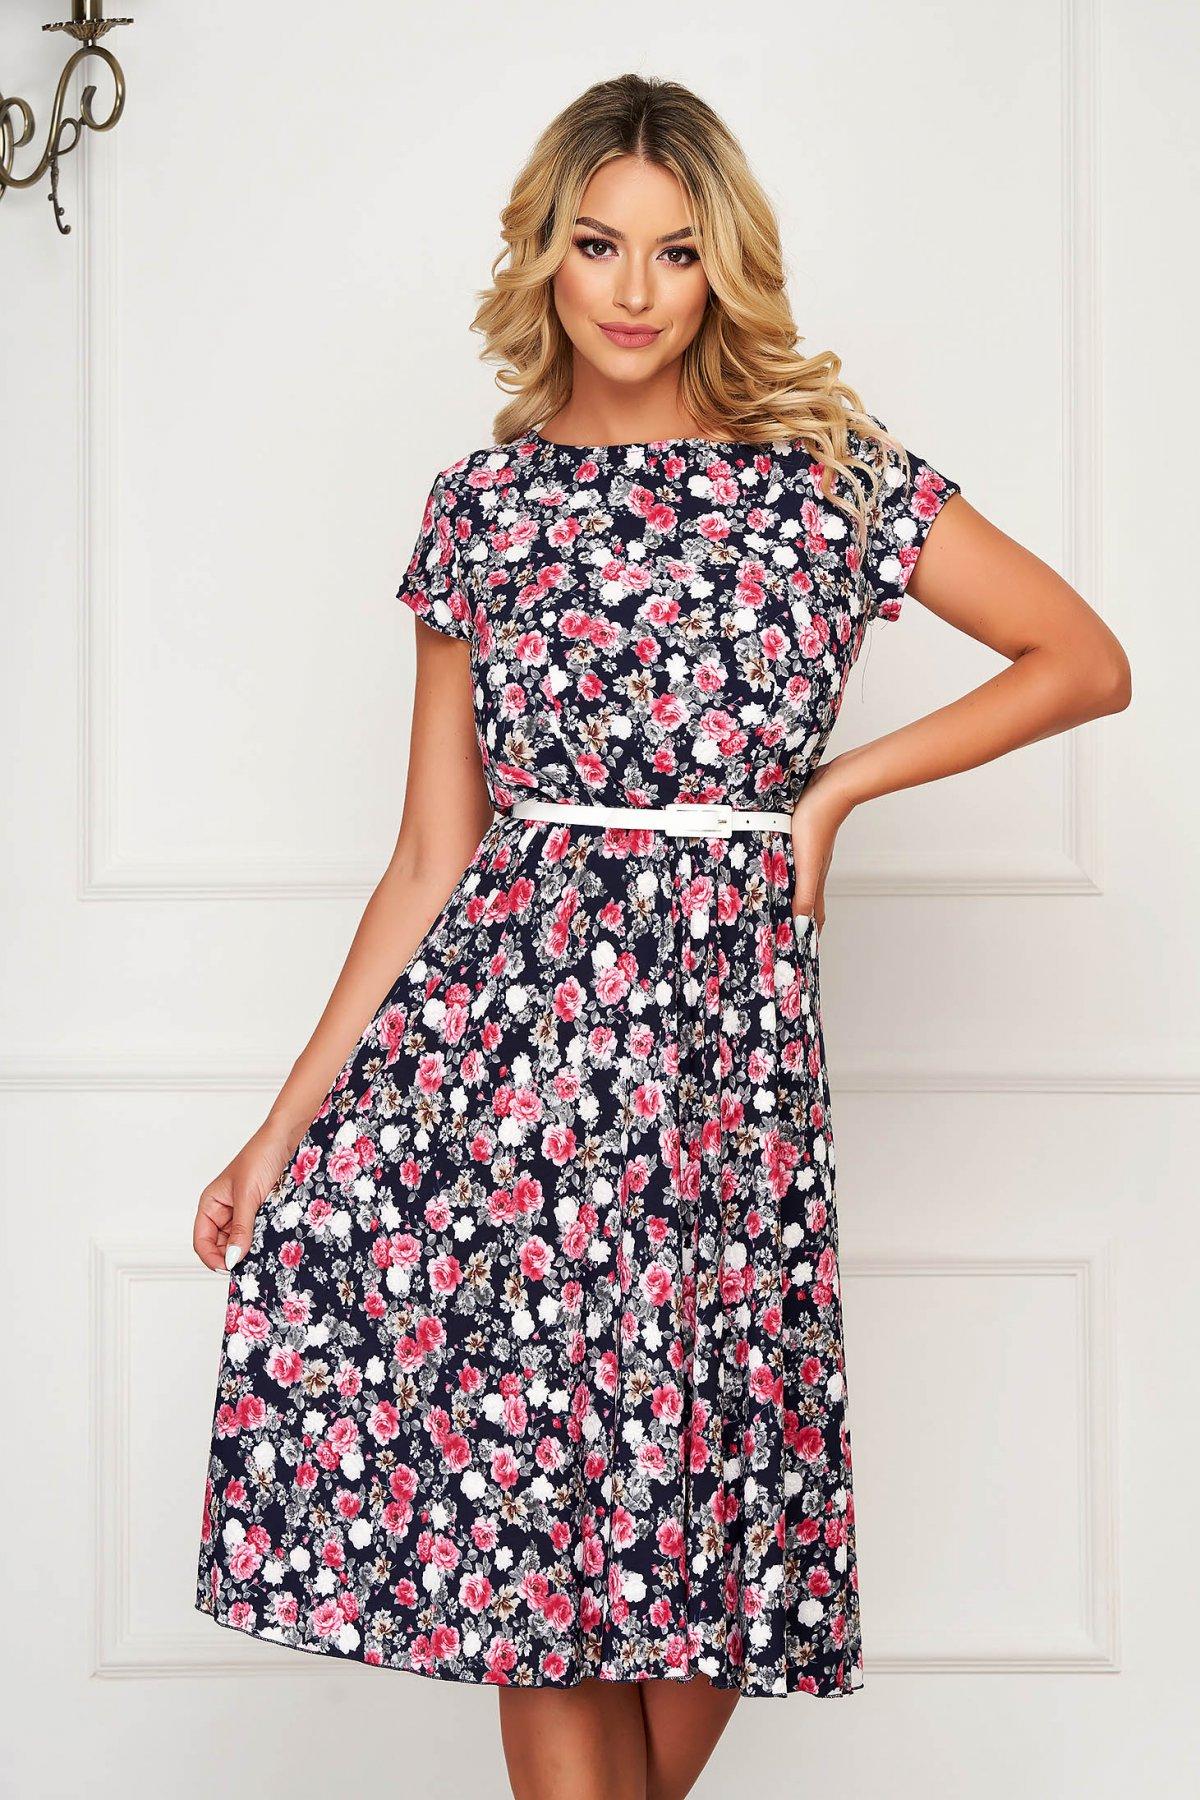 Rochie roz de zi midi cu maneca scurta din material subtire cu imprimeu floral cu accesoriu tip curea